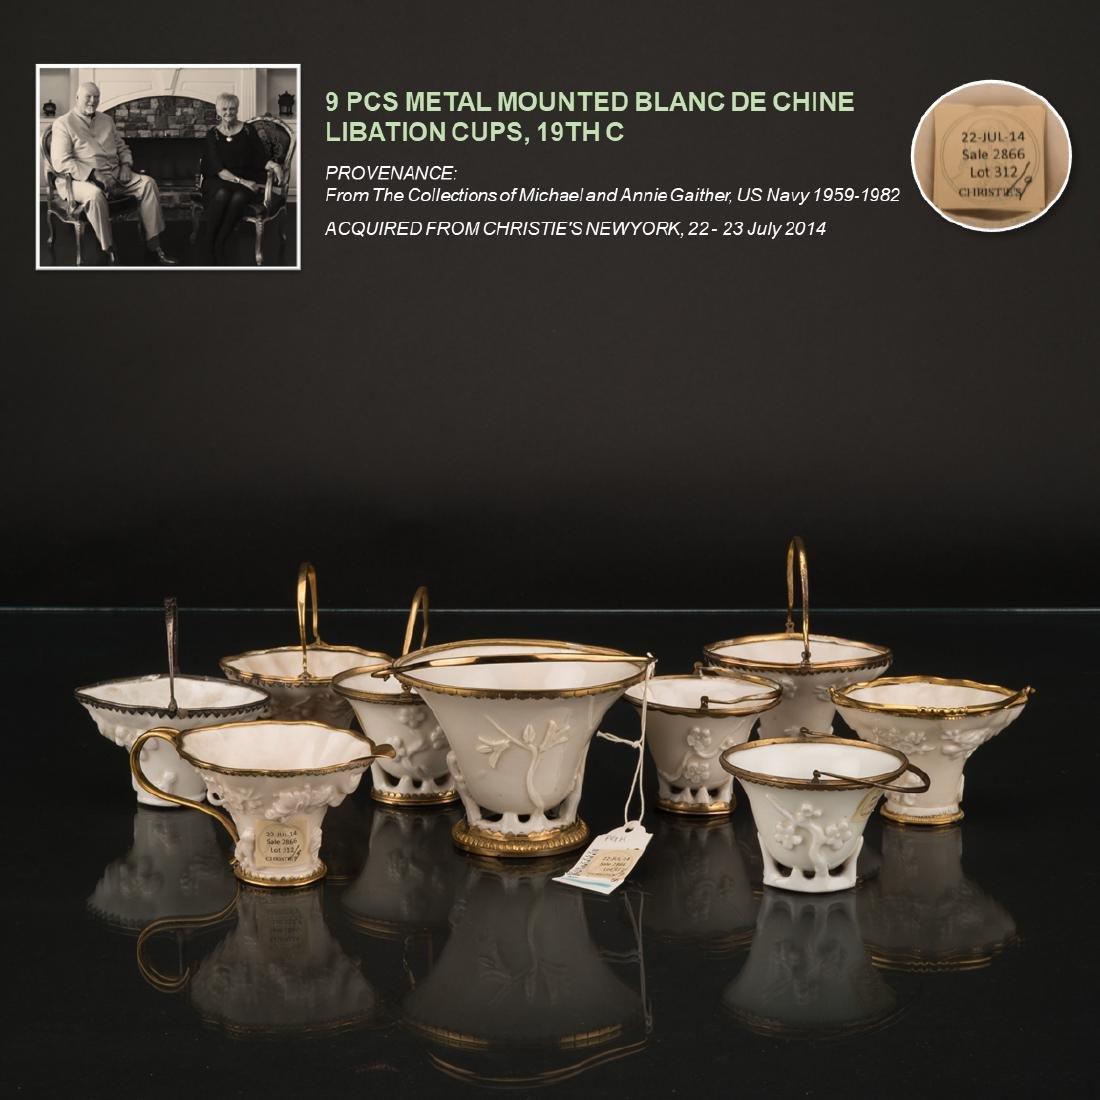 9 METAL MOUNTED BLANC DE CHINE LIBATION CUPS, 19TH C